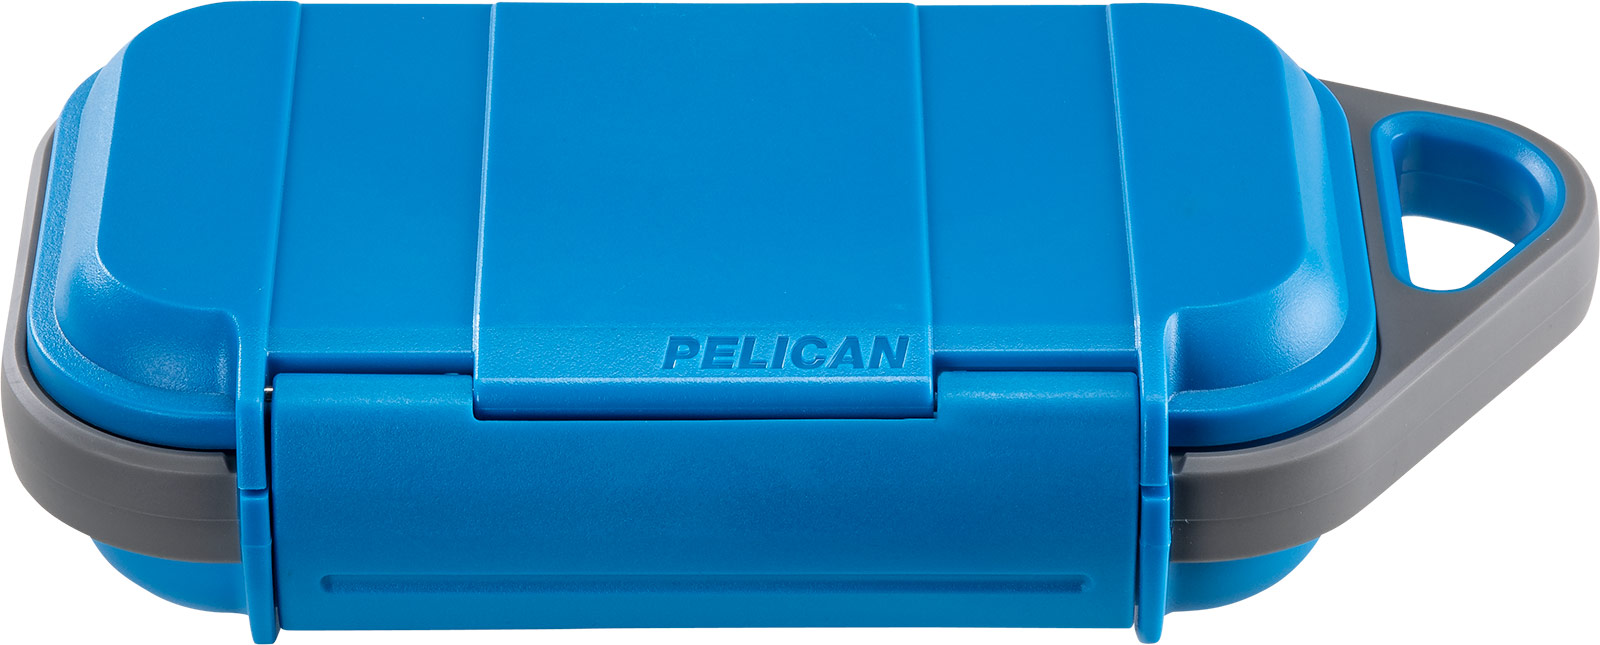 pelican micro blue go case g40